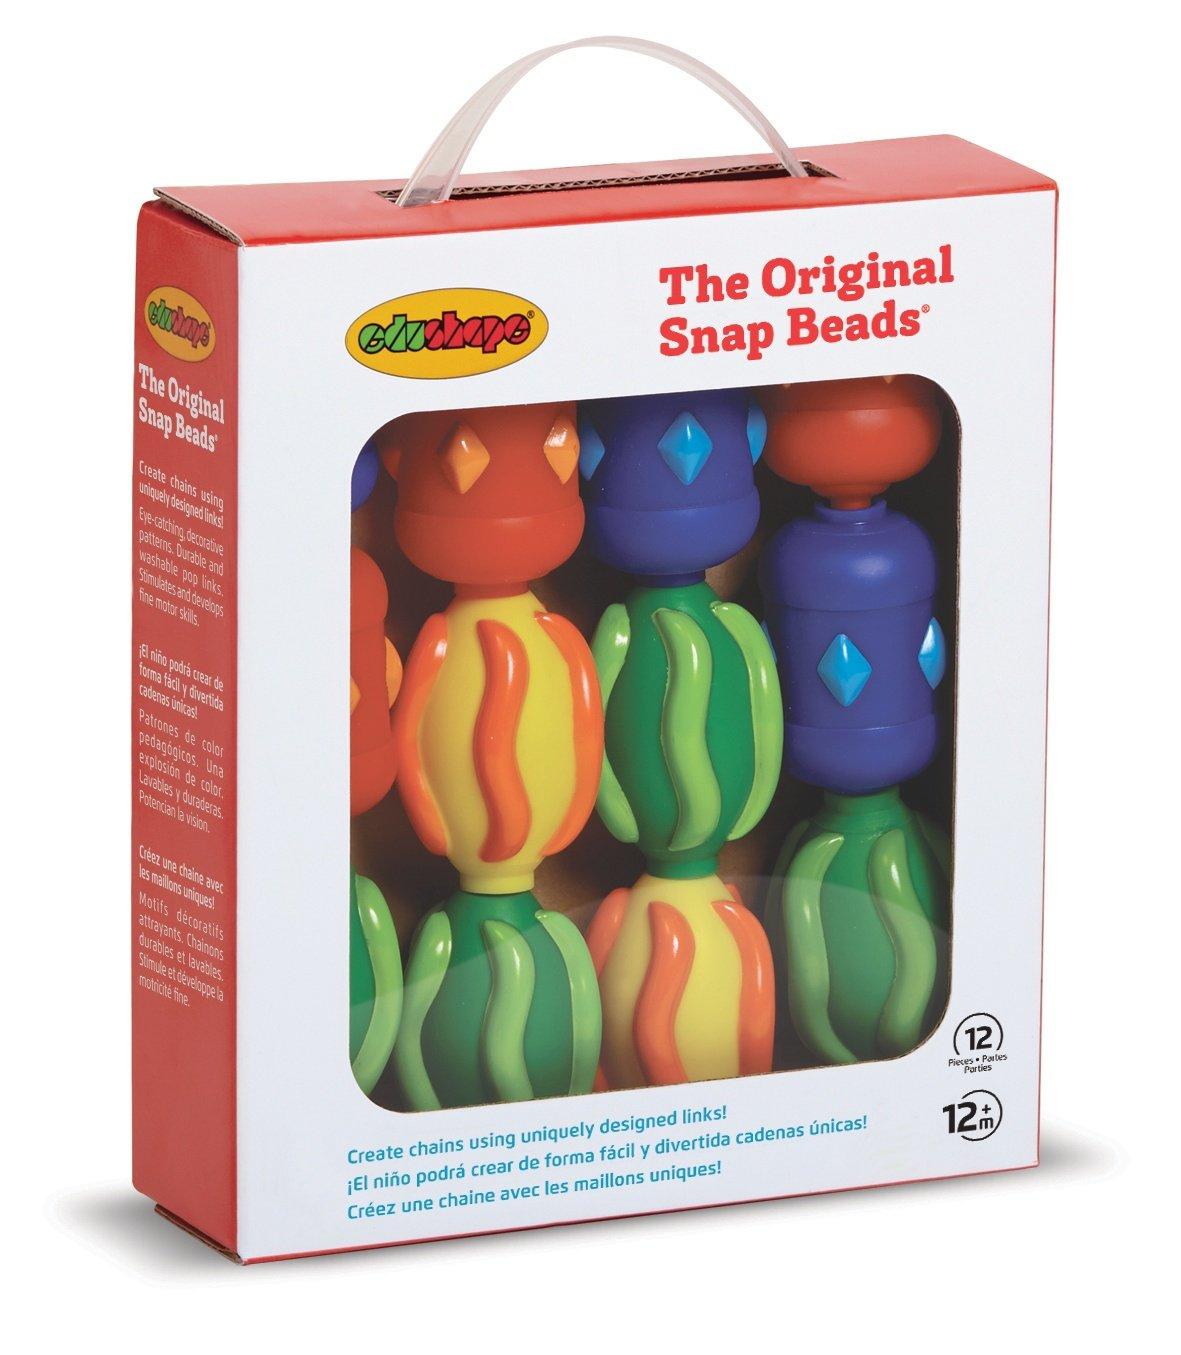 Edushape Original Snap Beads Box